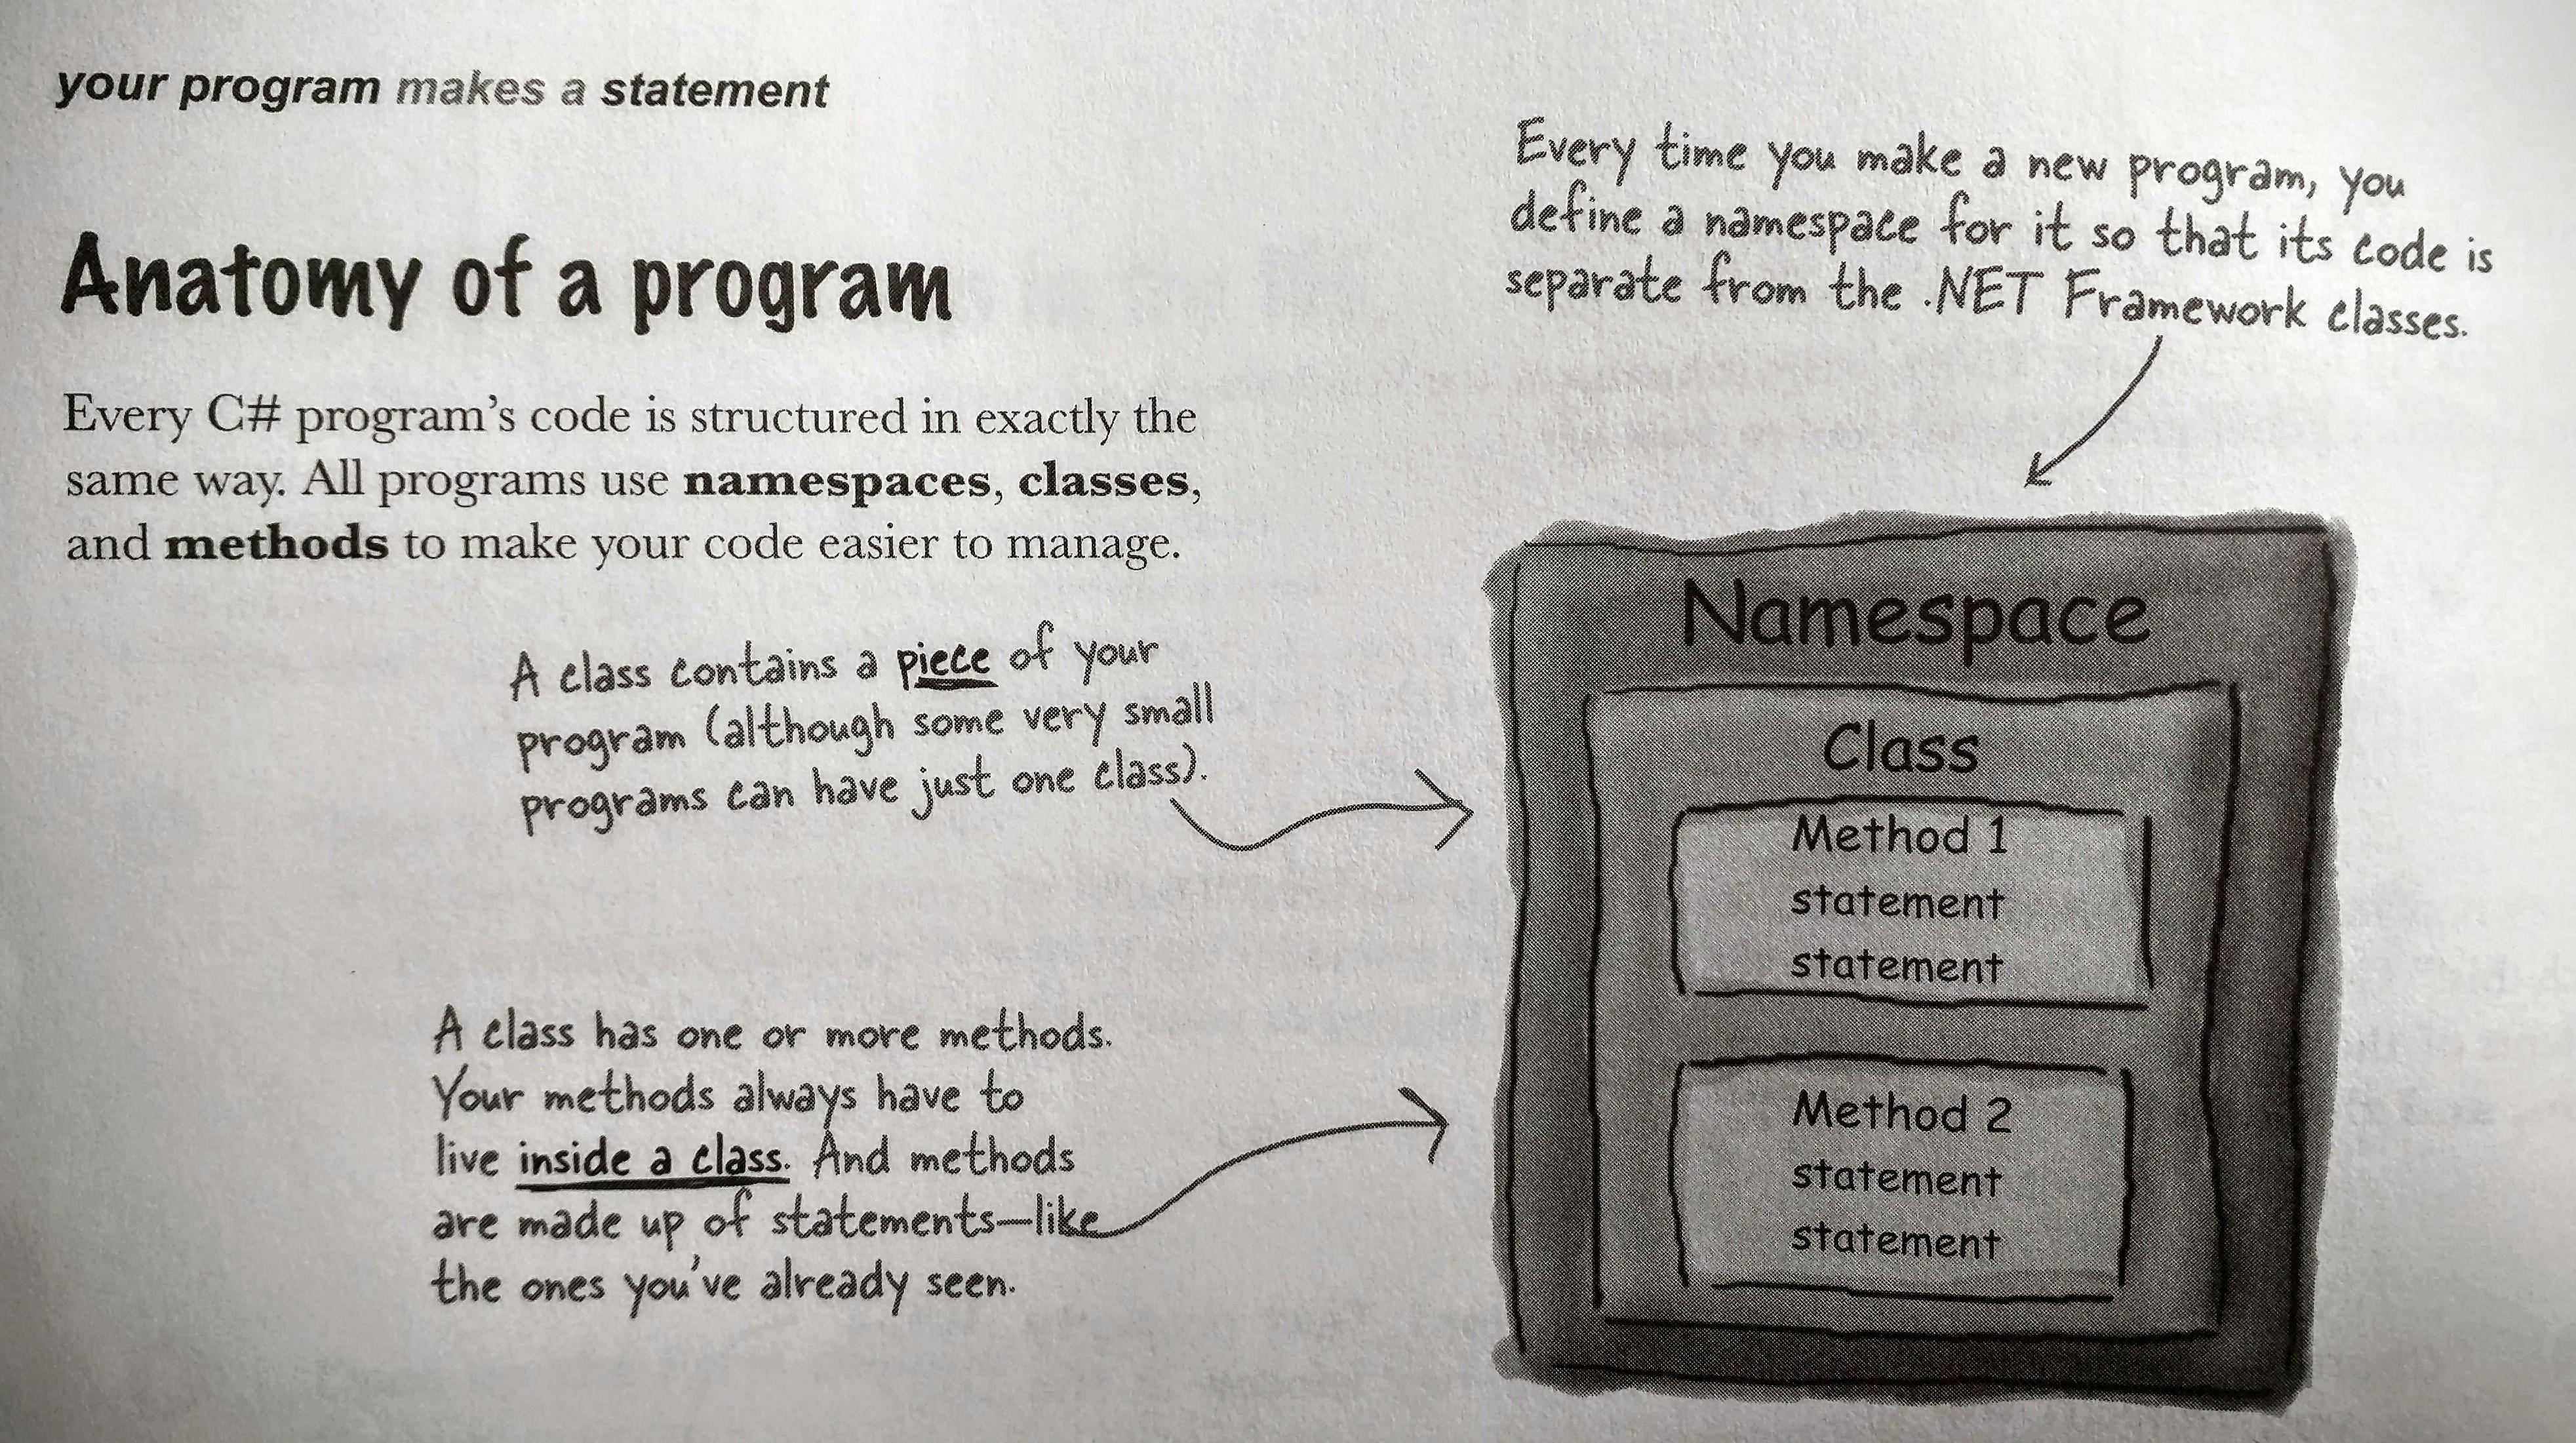 C# Namespace Class Method Statement